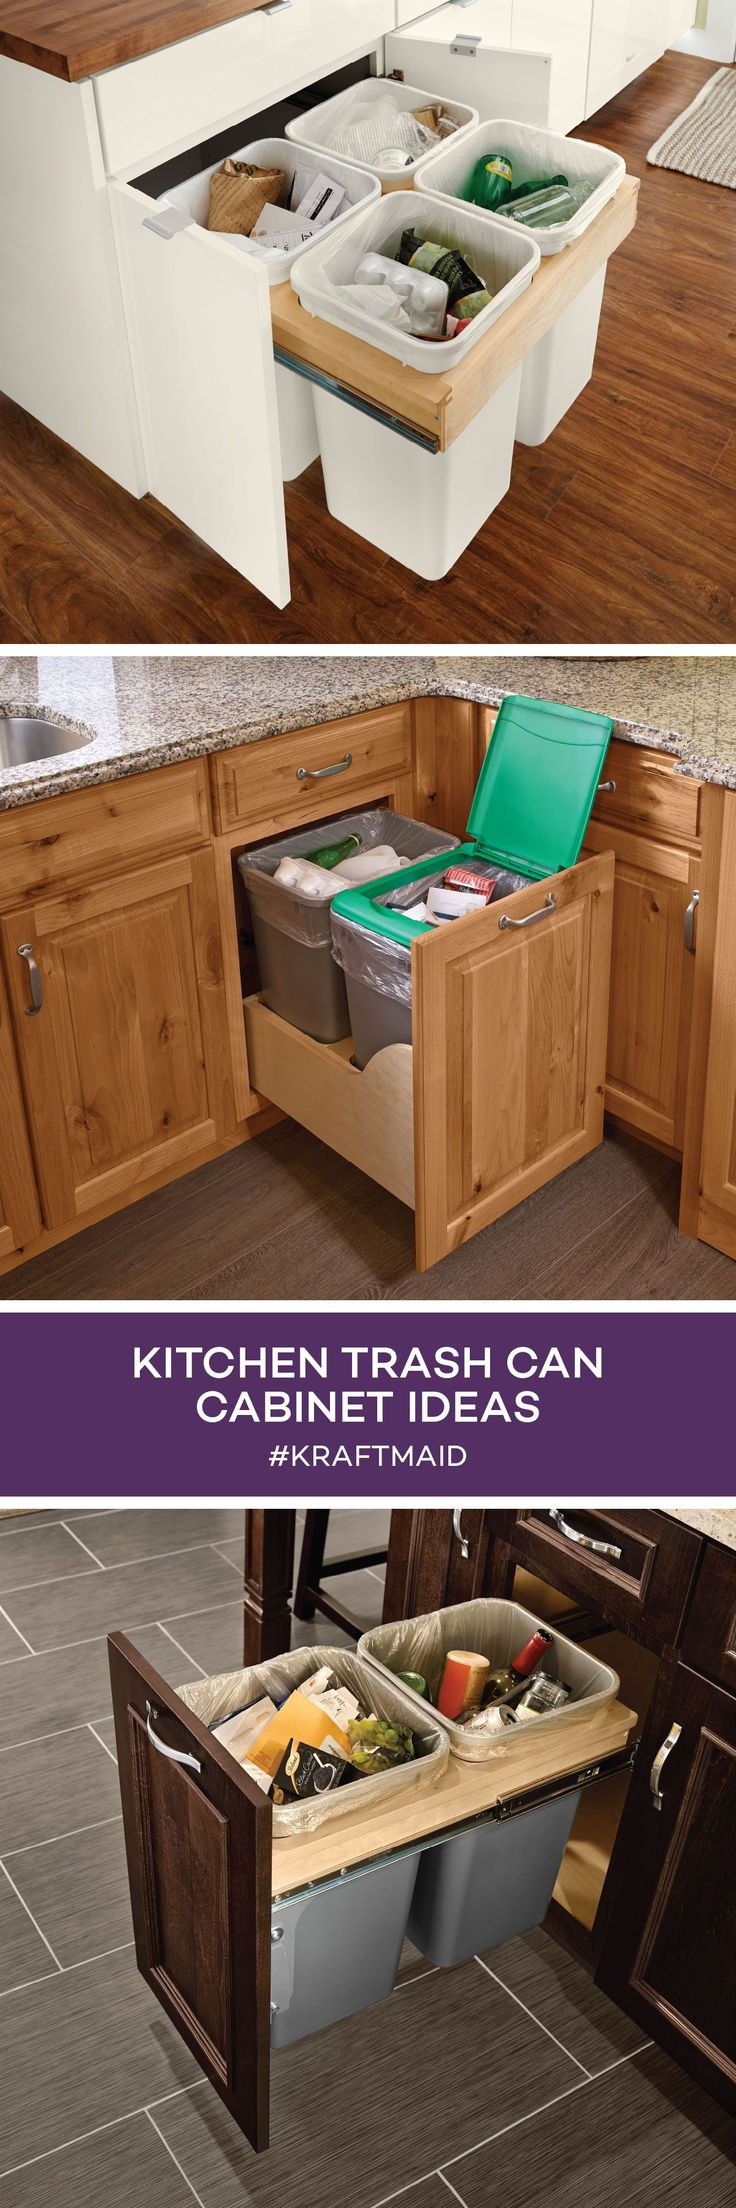 Best 25 trash bins ideas on pinterest trash can cabinet hidden trash can kitchen and hidden - Kitchen trash can ideas ...